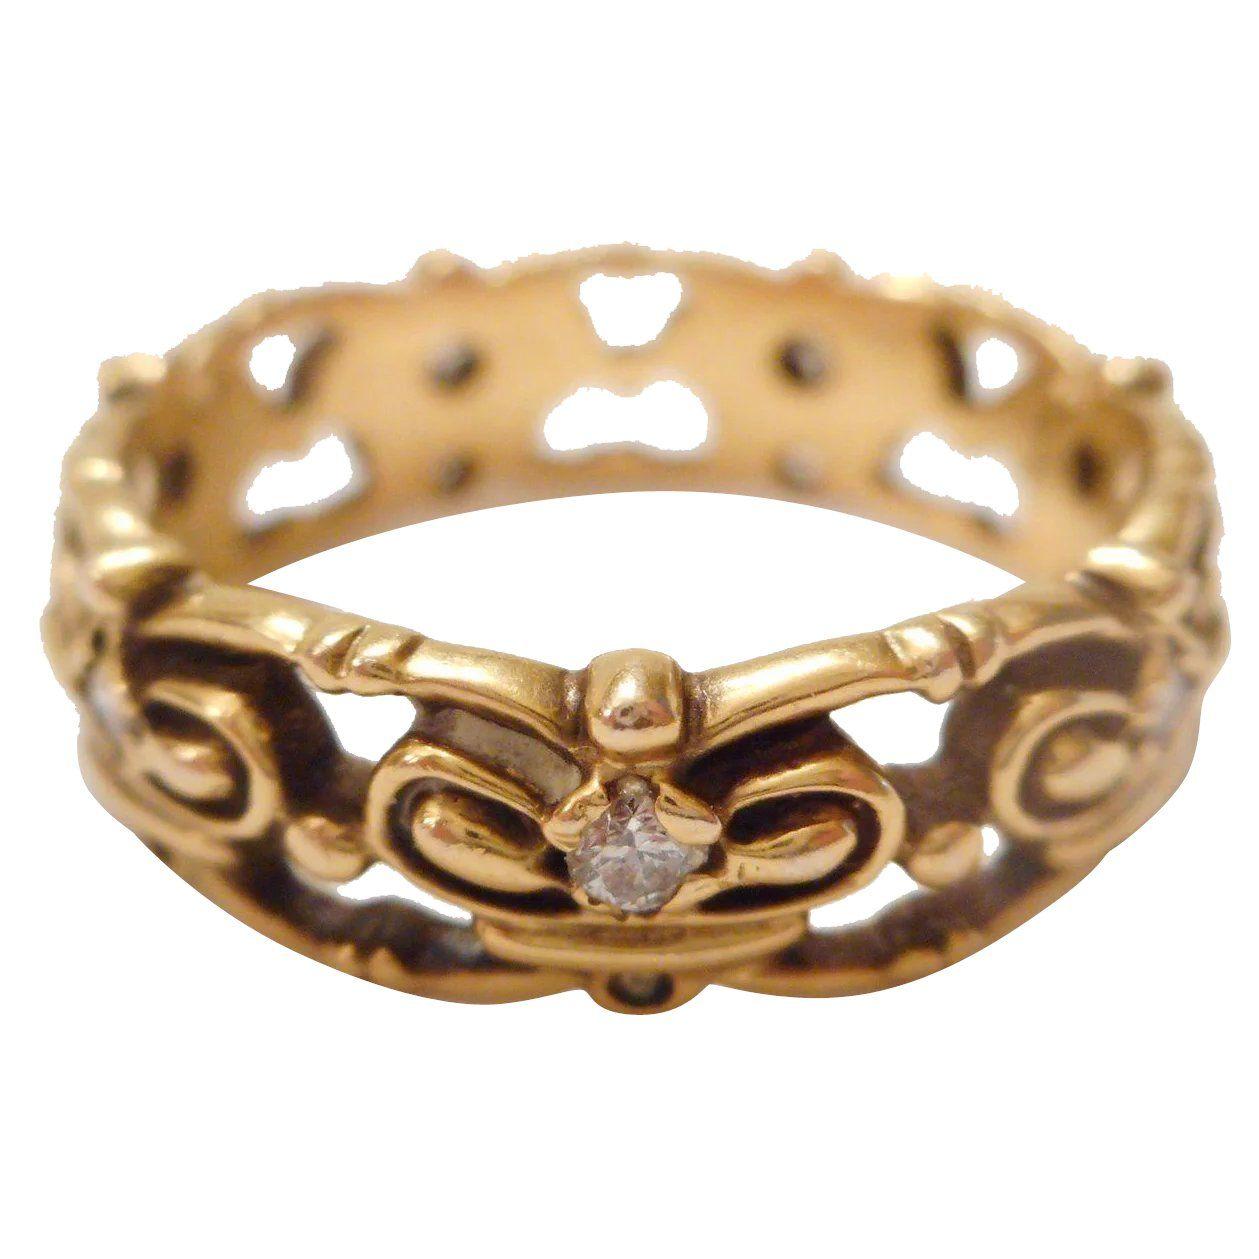 FANCY Vintage 14kt Yellow Gold & Diamond CROWN Wedding or